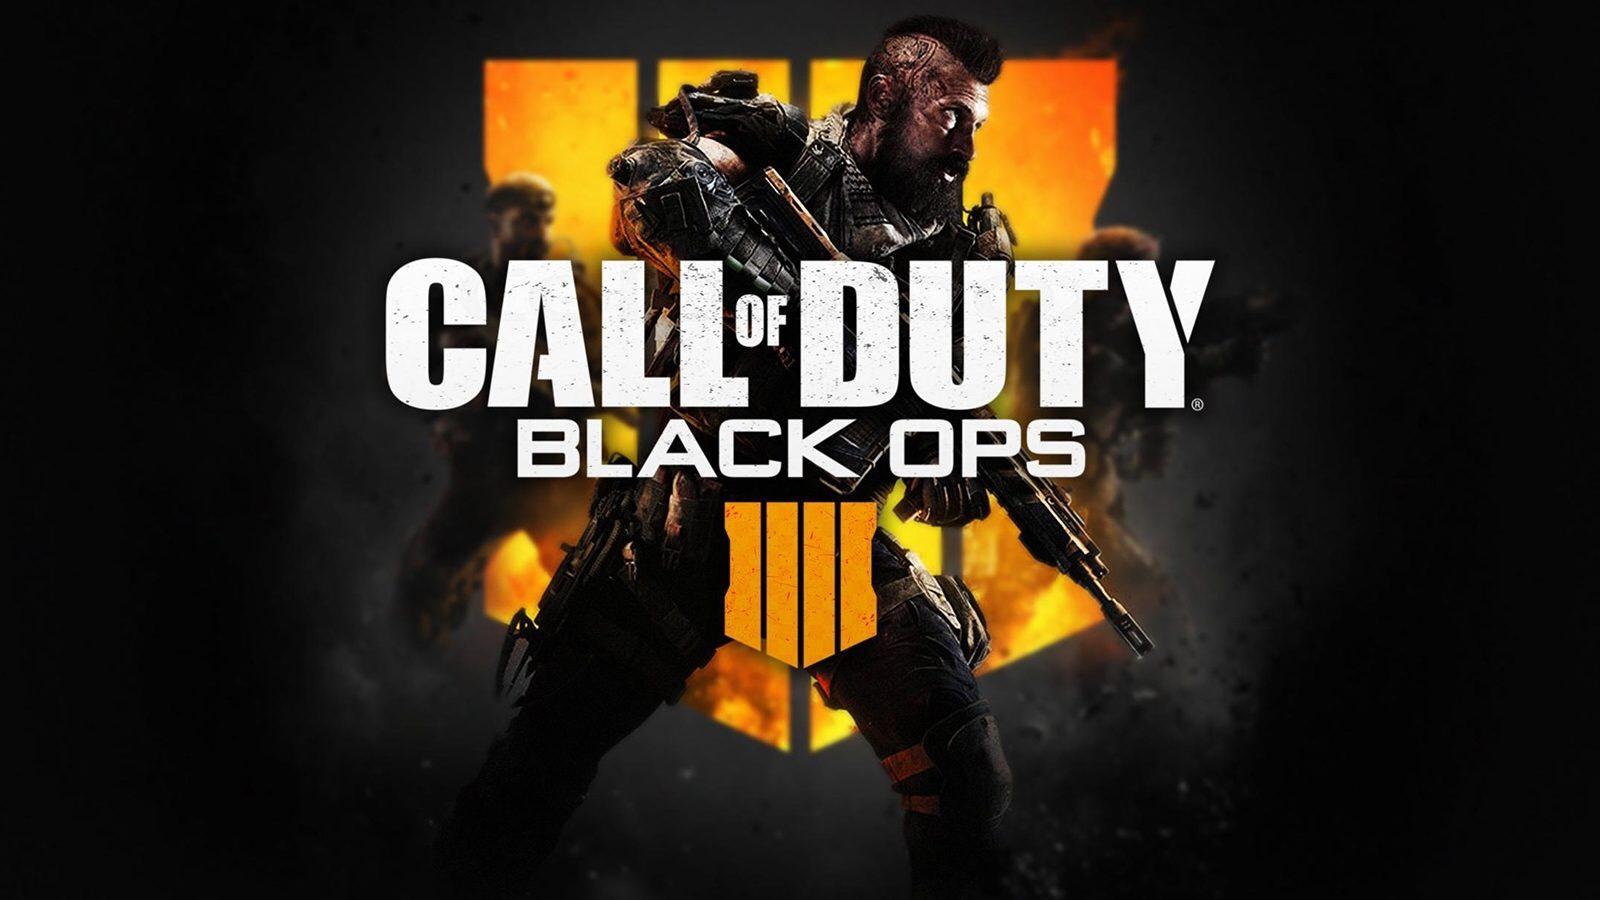 Call of Duty Black Ops 4 (PC) direkt über Blizzard [VPN]